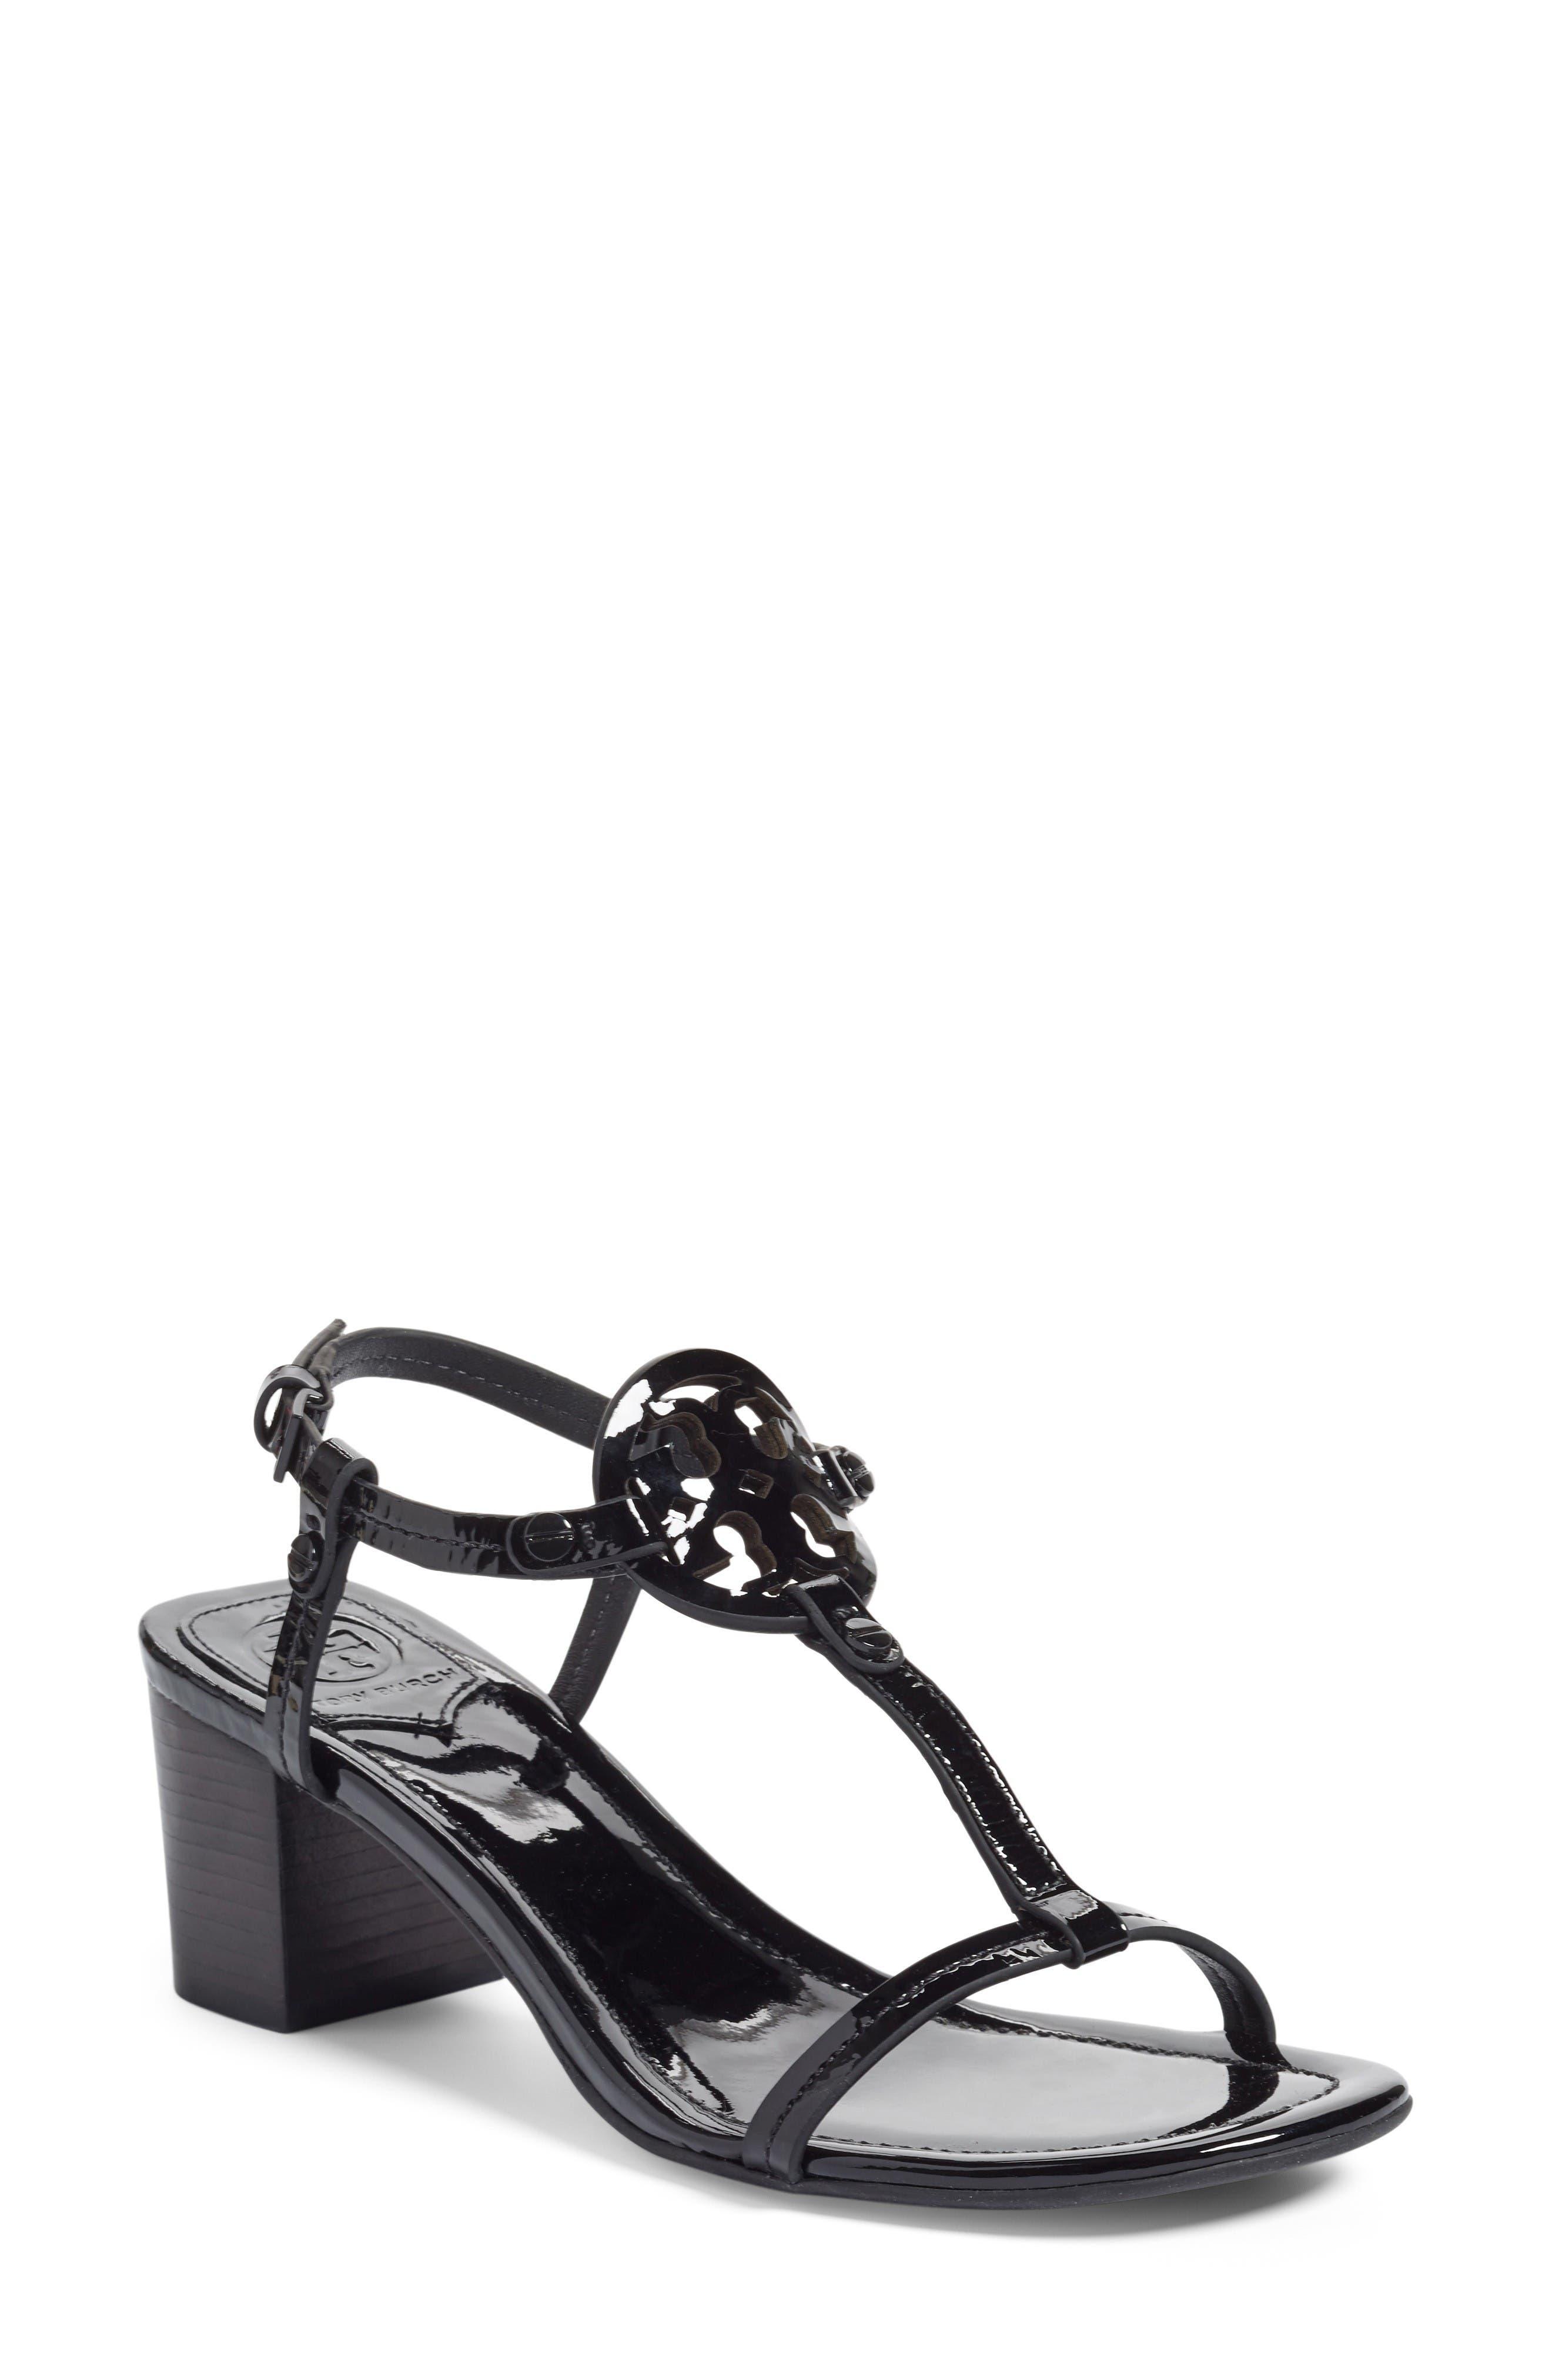 Alternate Image 1 Selected - Tory Burch Miller Block Heel Sandal (Women)